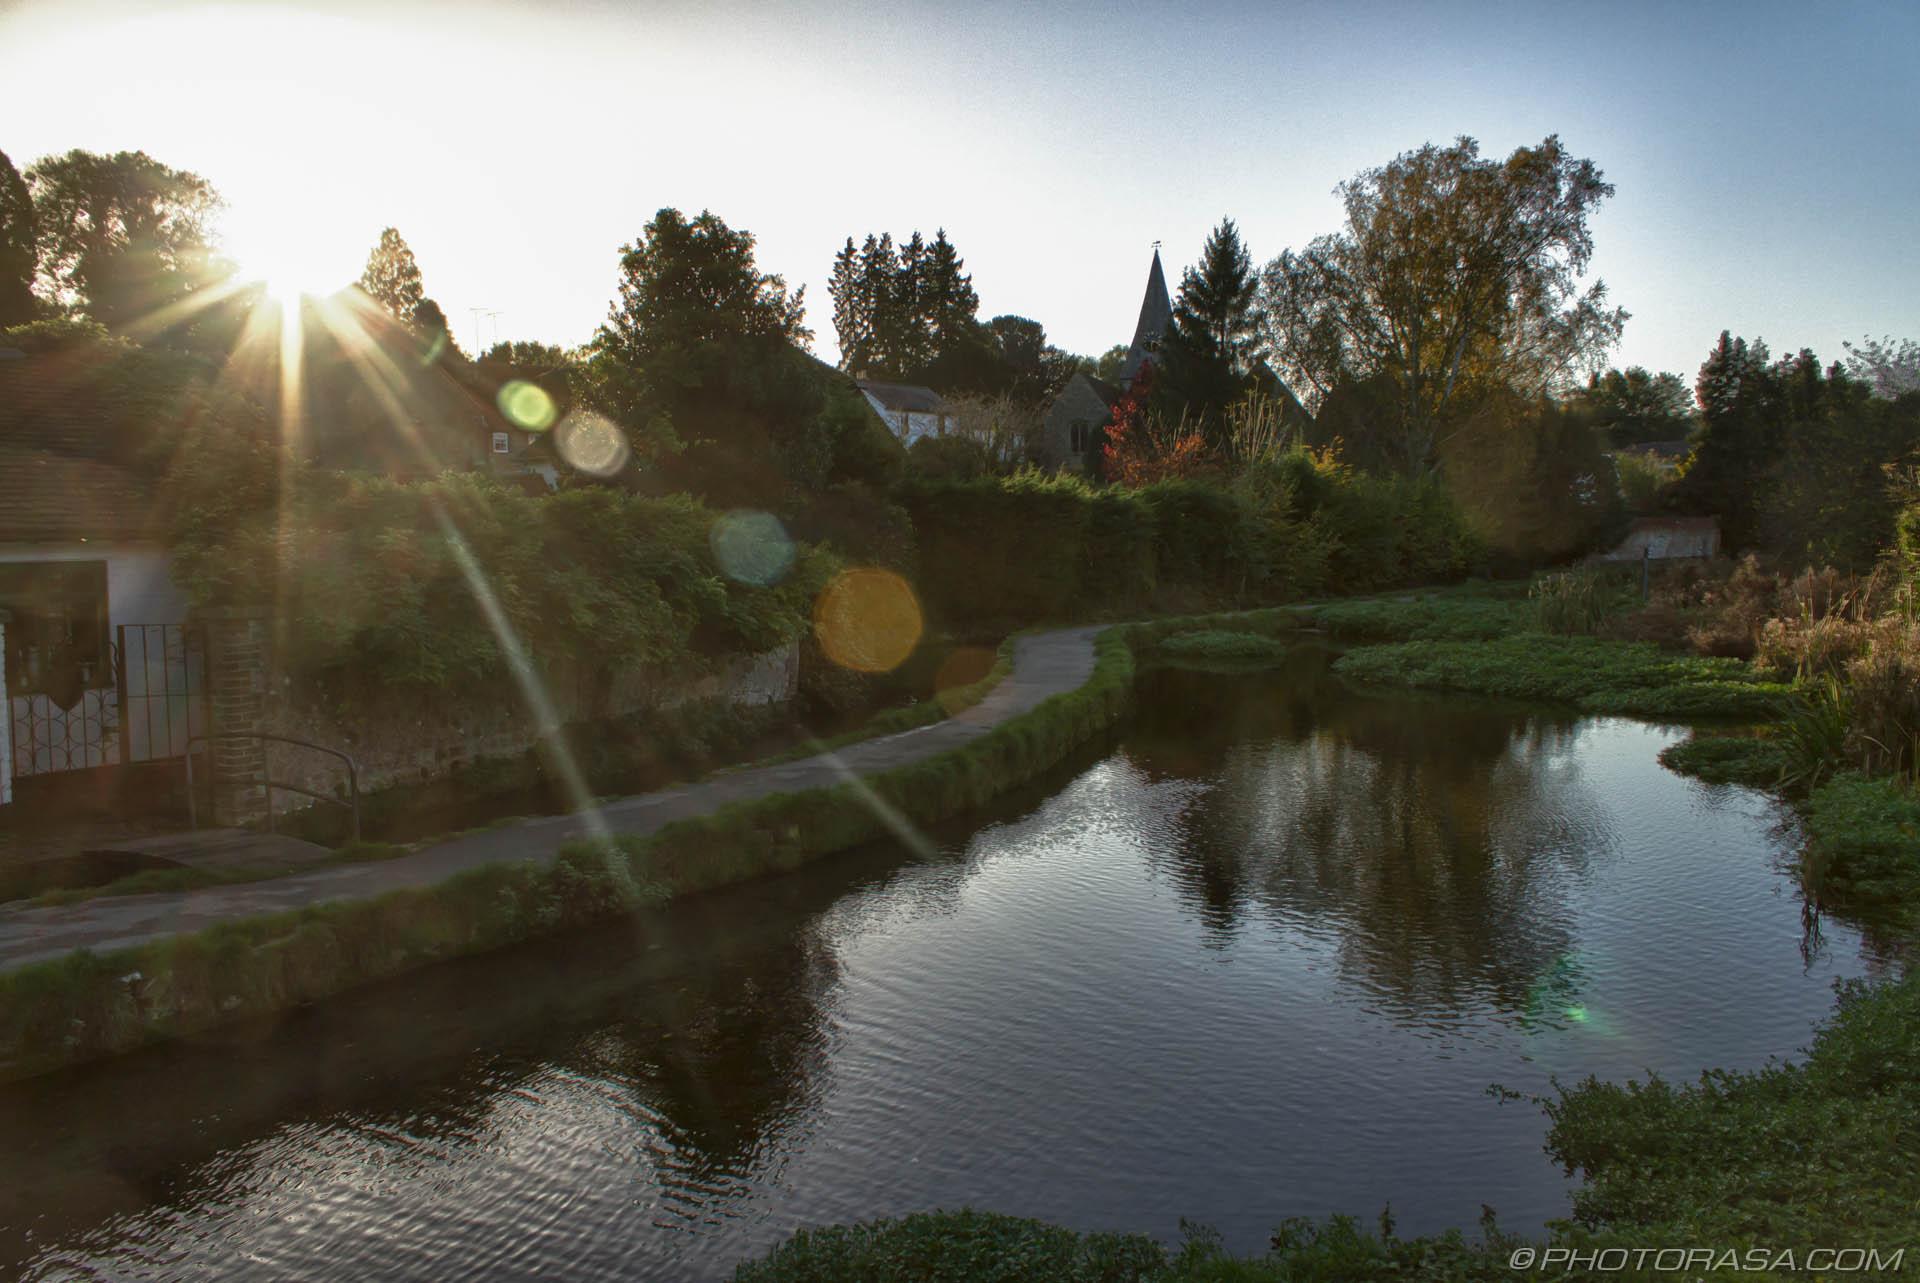 https://photorasa.com/loose-village/loose-stream-and-sunrays/